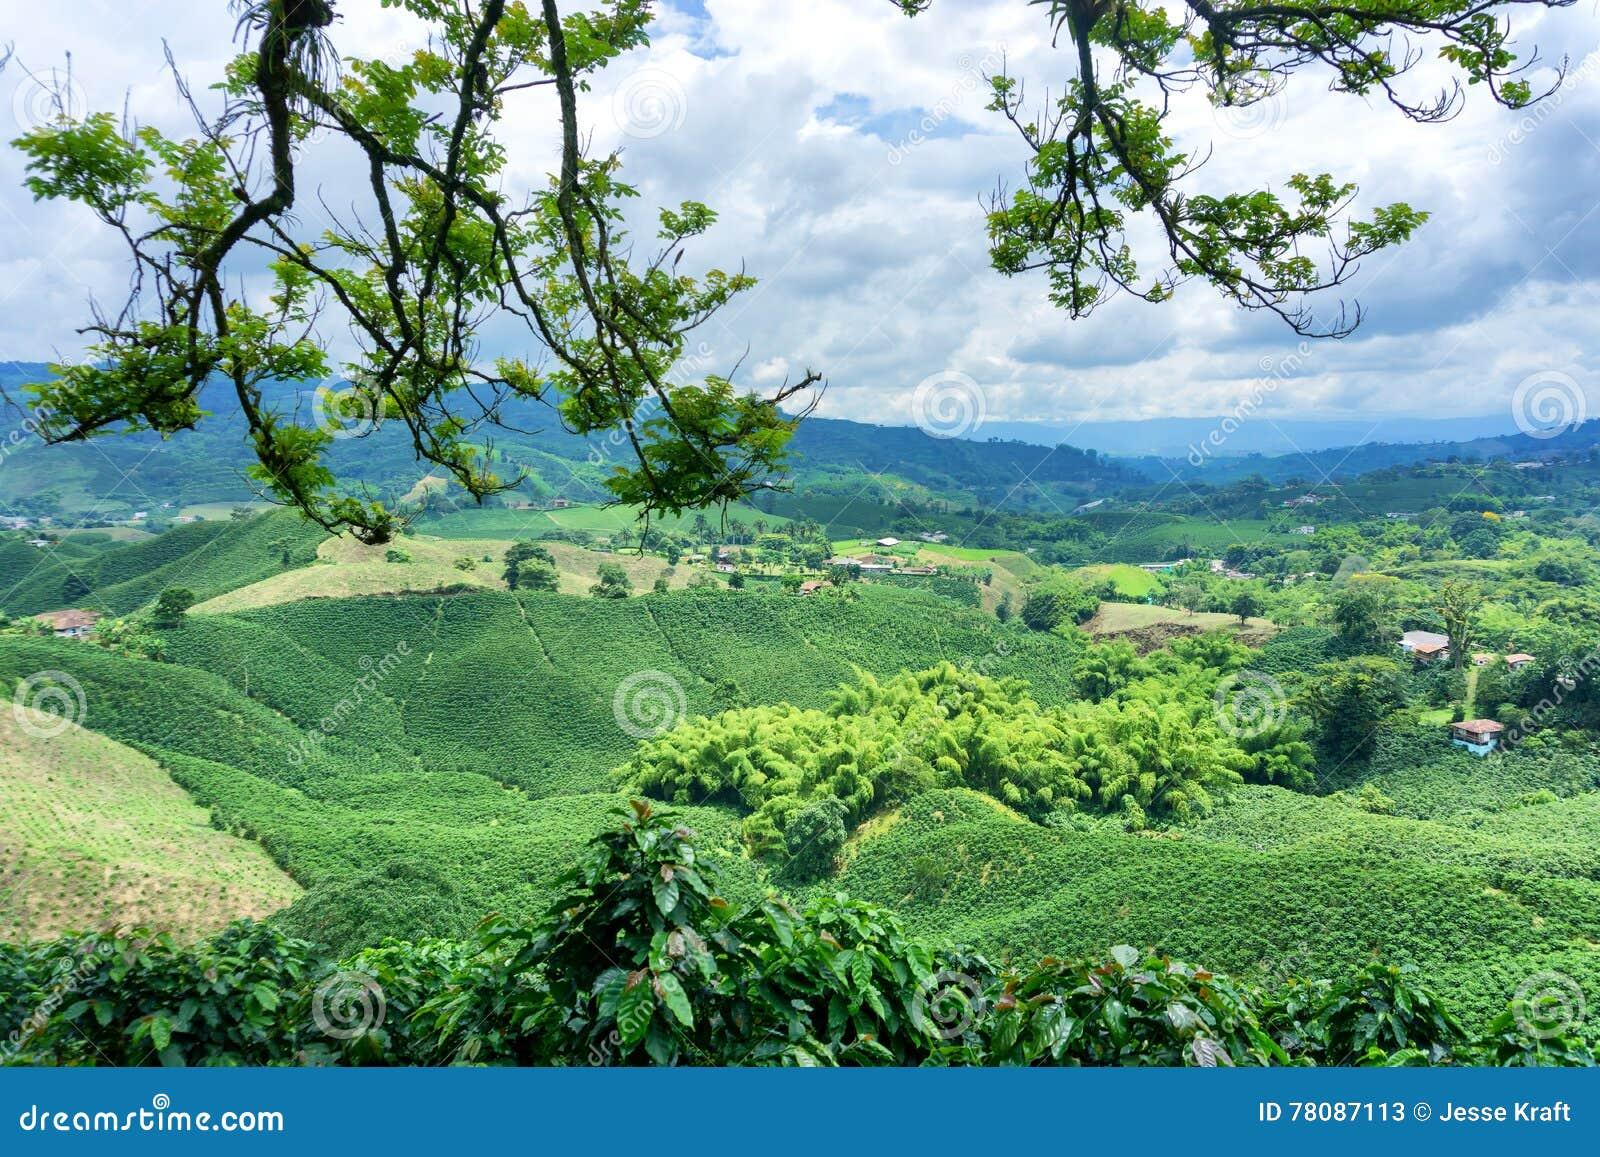 Coffee Landscape in Colombia